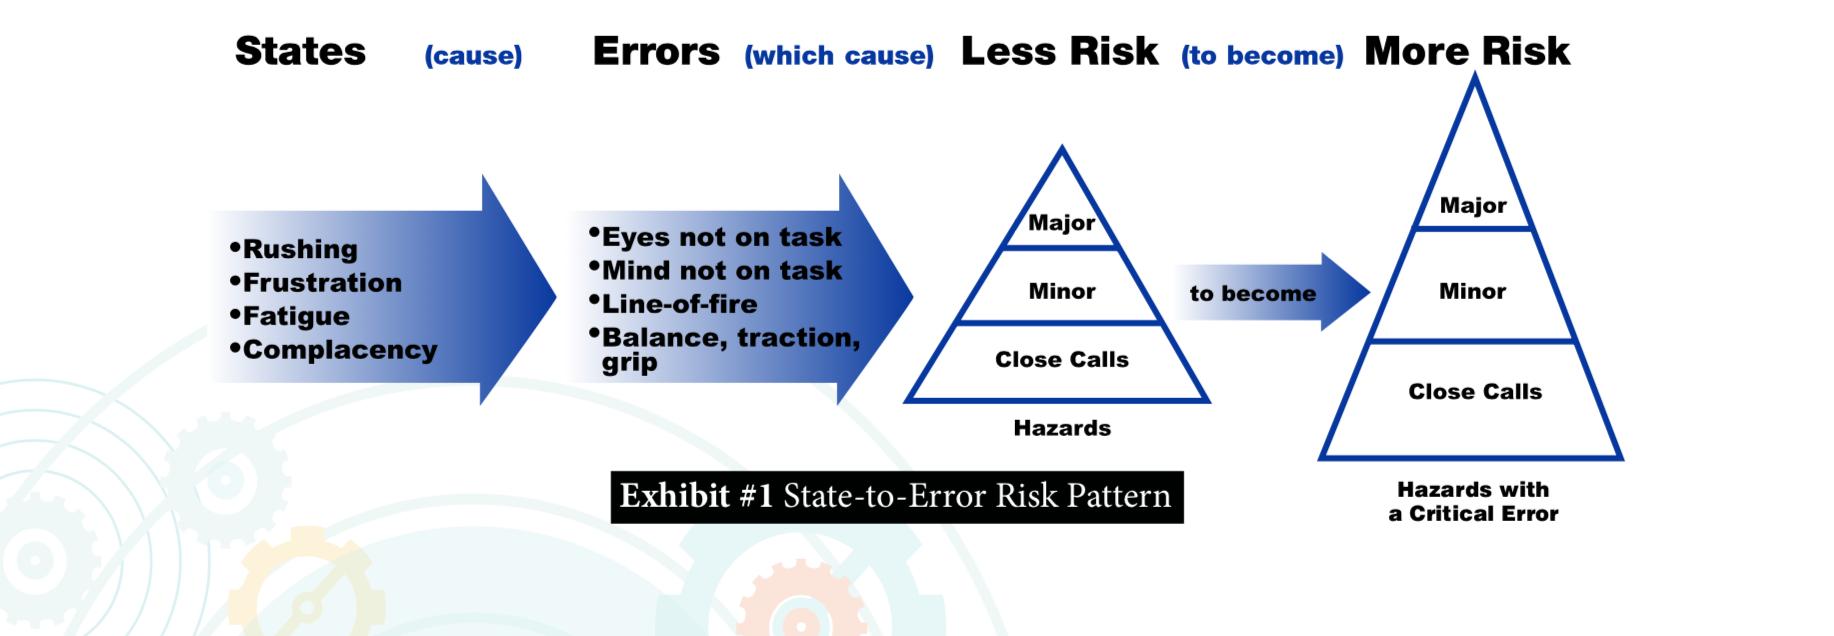 states-errors